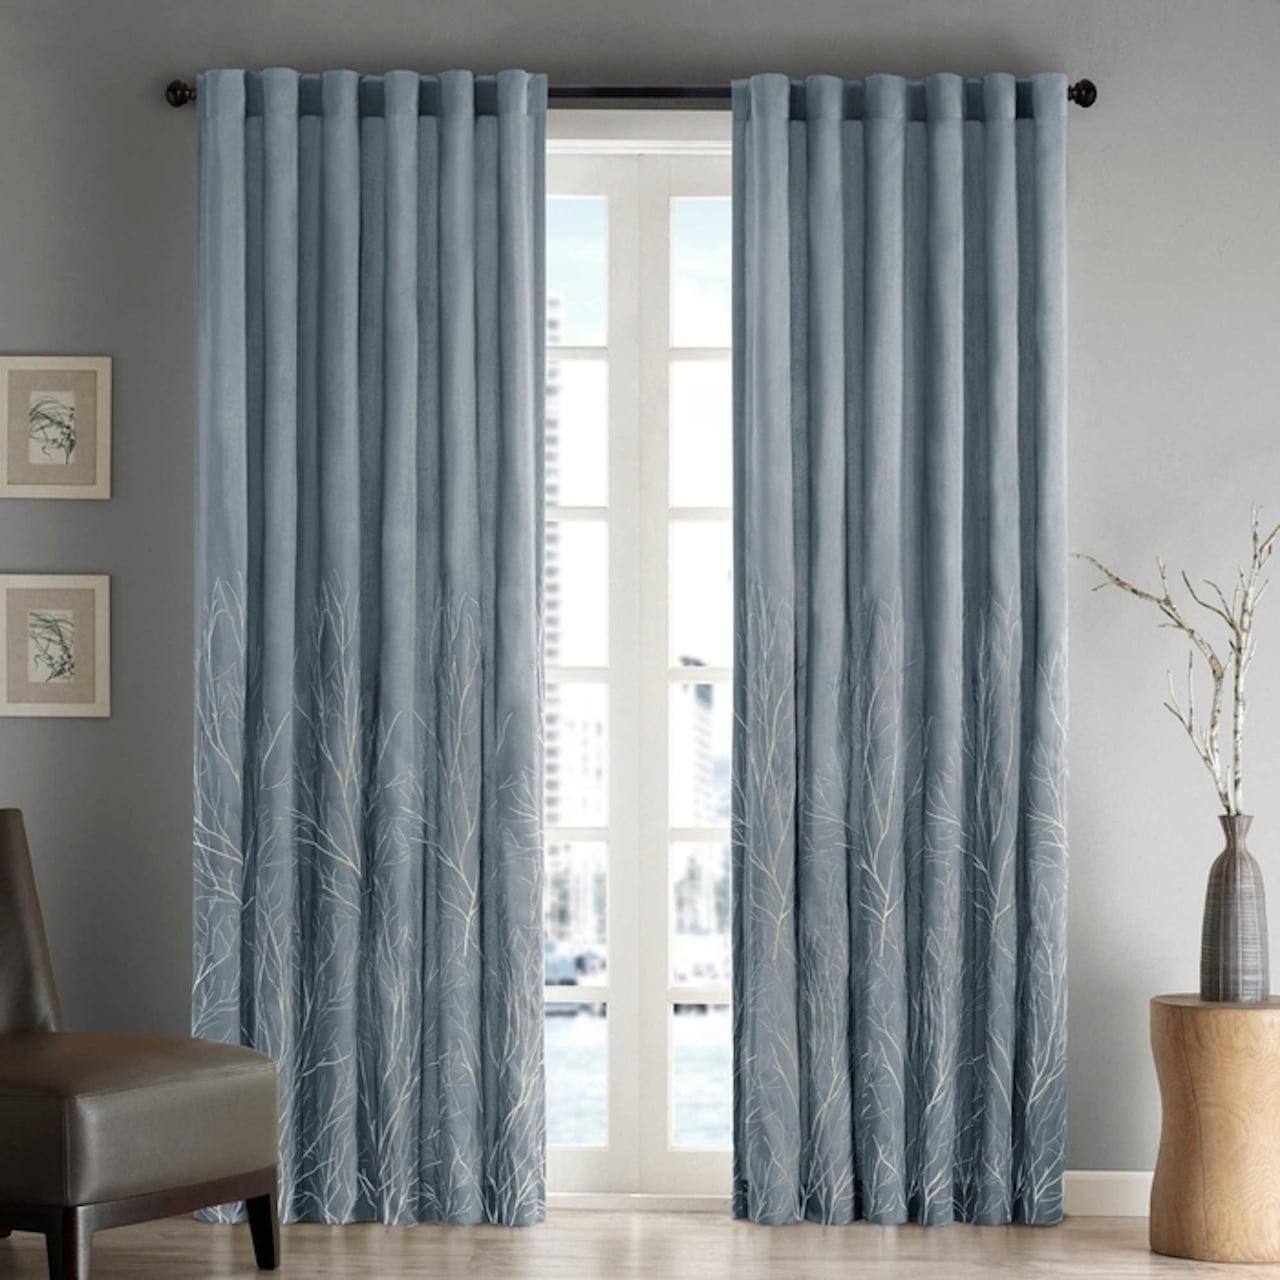 Andora 95-Inch Window Curtain Panel - image 1 de 1